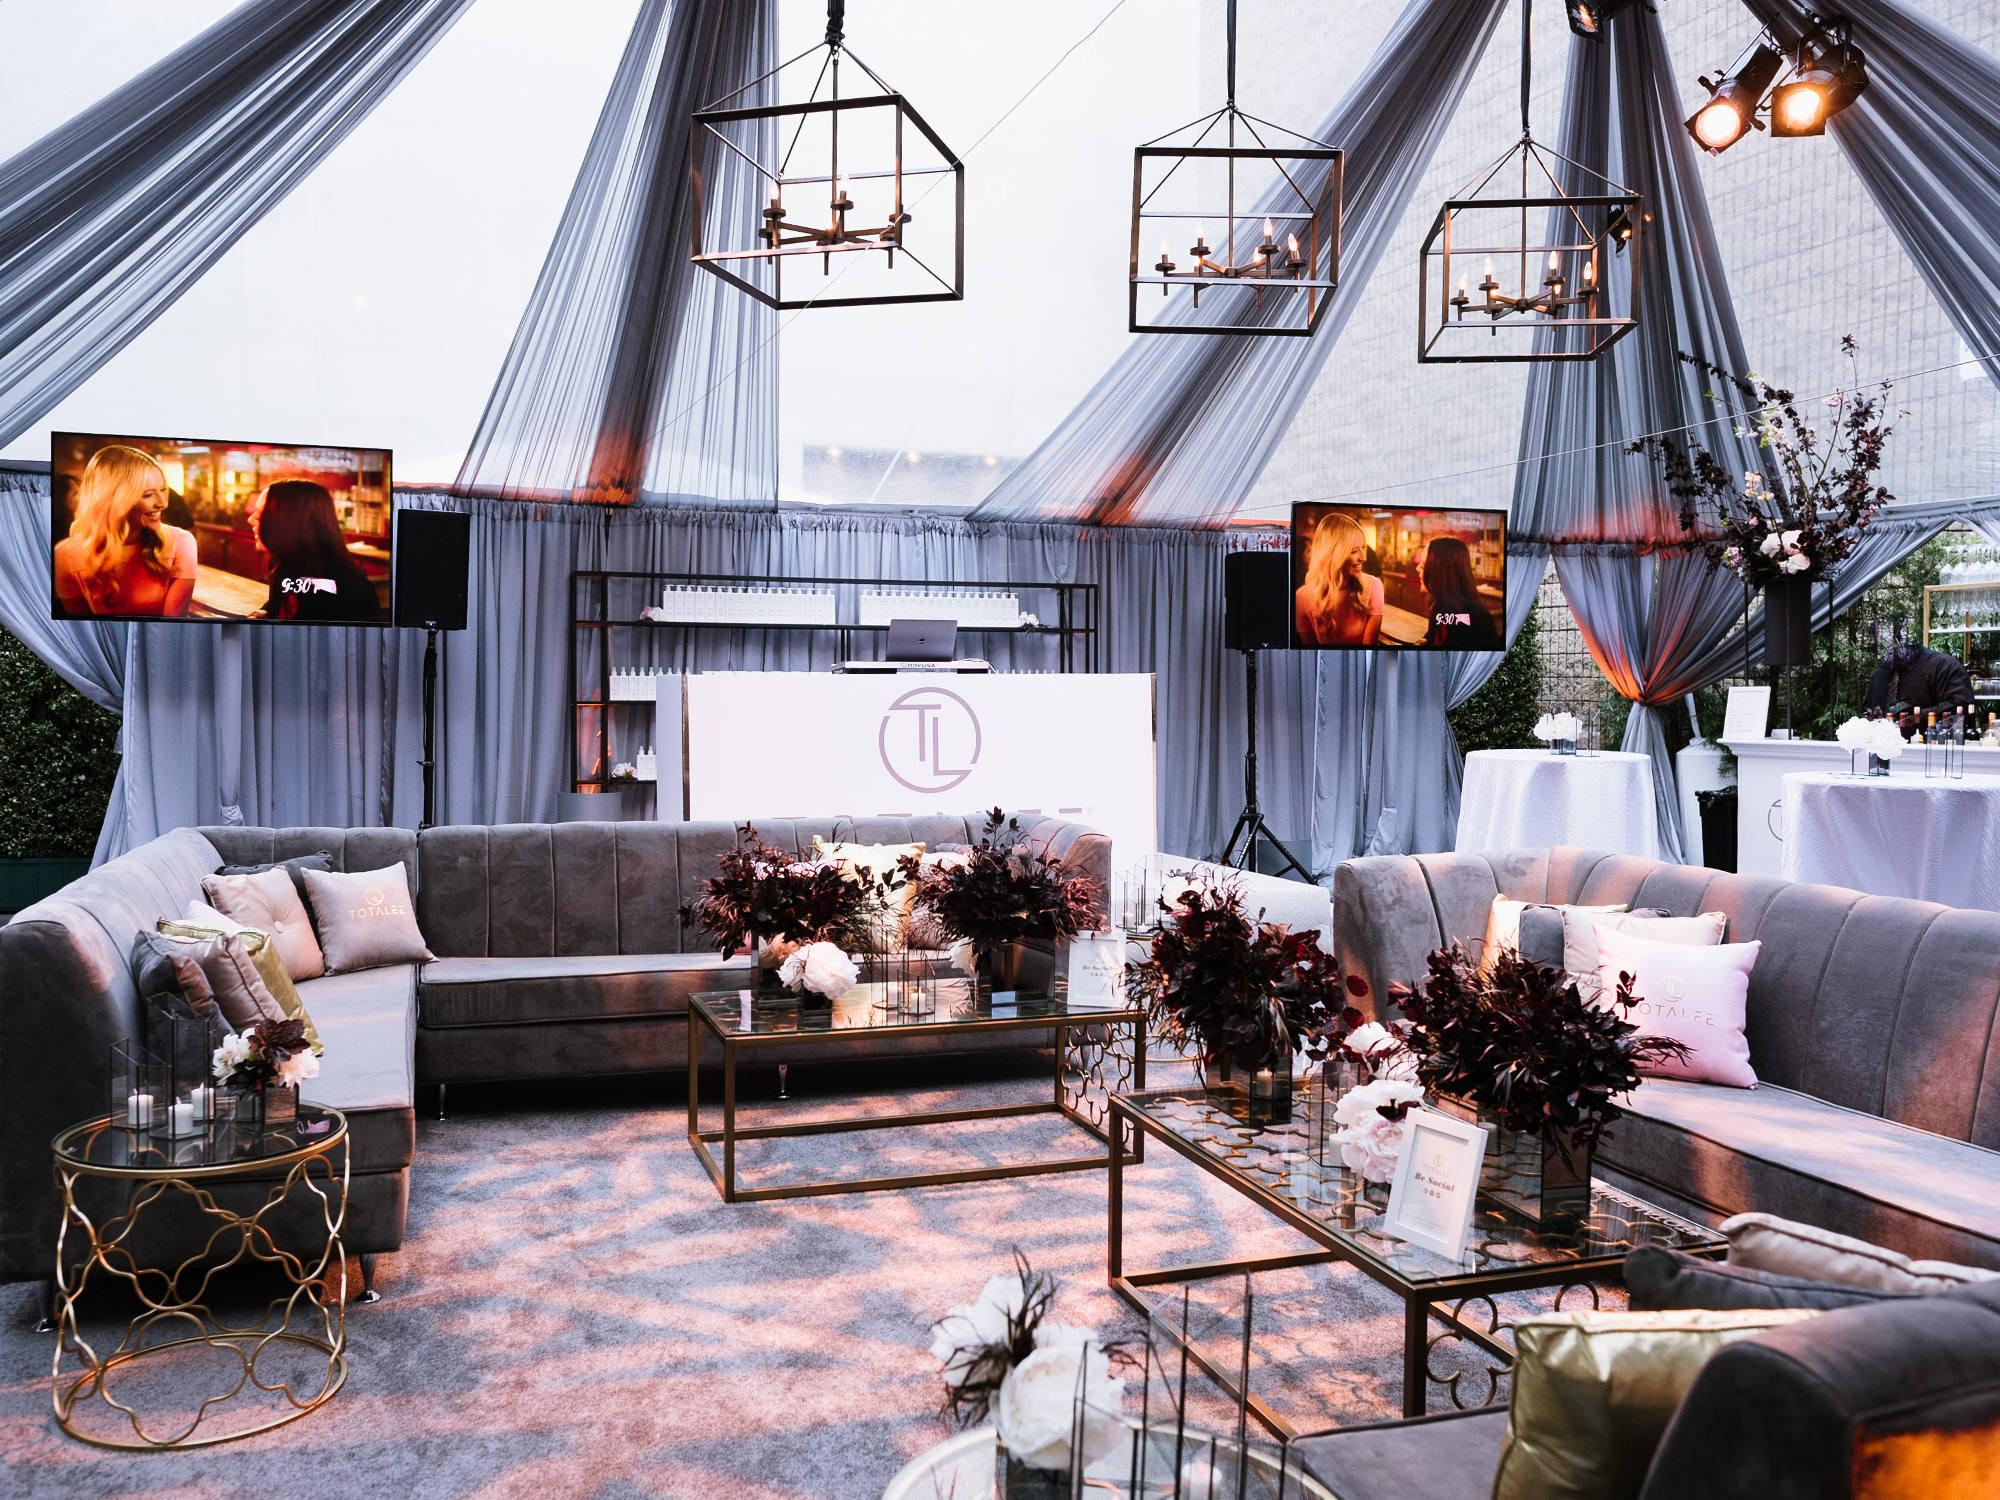 Groovy Event Furniture Rental Weddings Corporate Events Machost Co Dining Chair Design Ideas Machostcouk